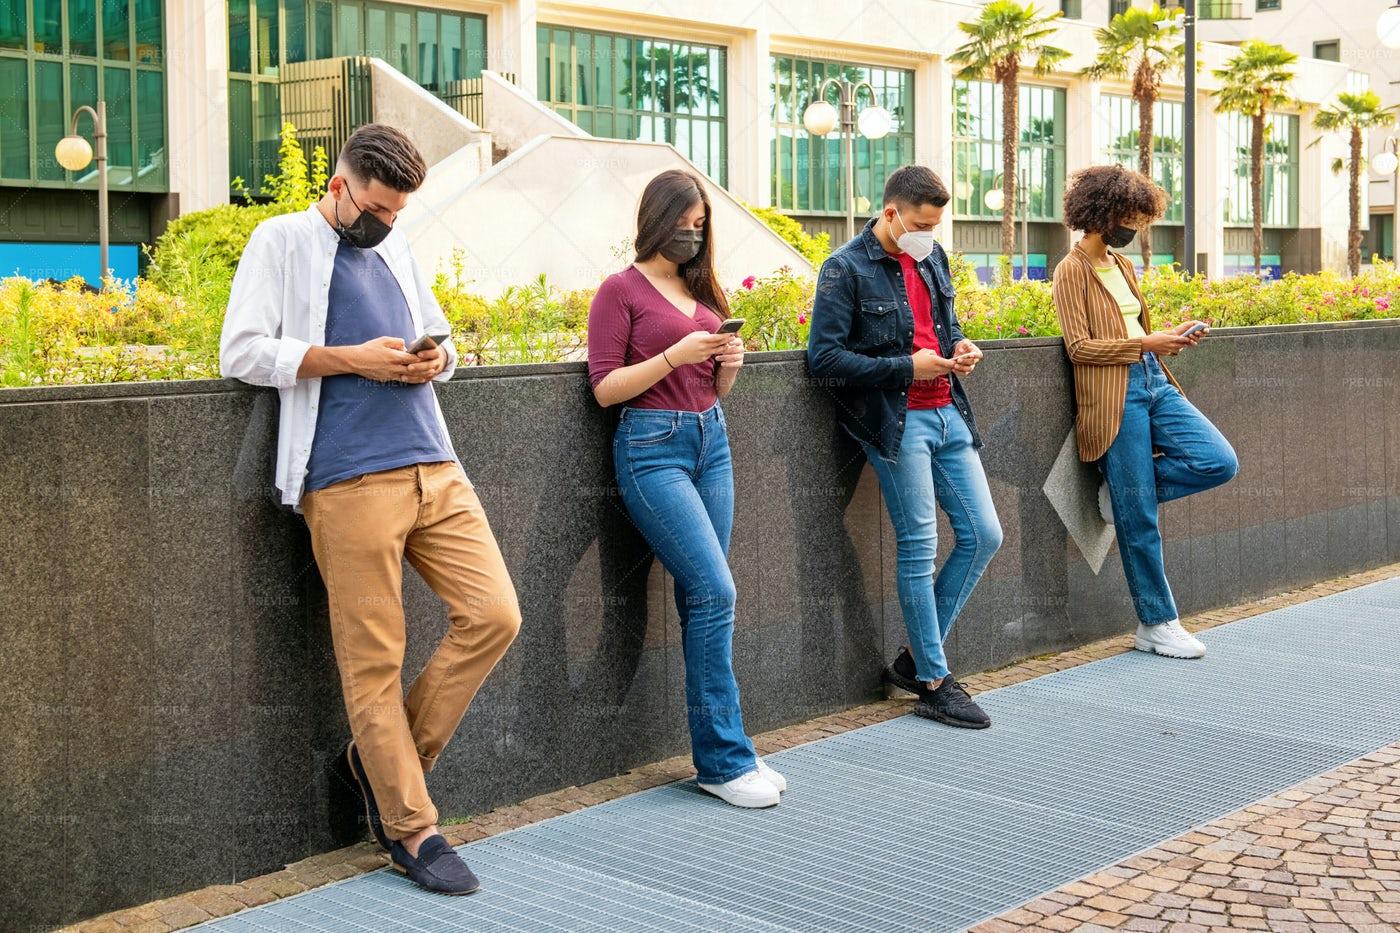 Texting And Social Distancing: Stock Photos